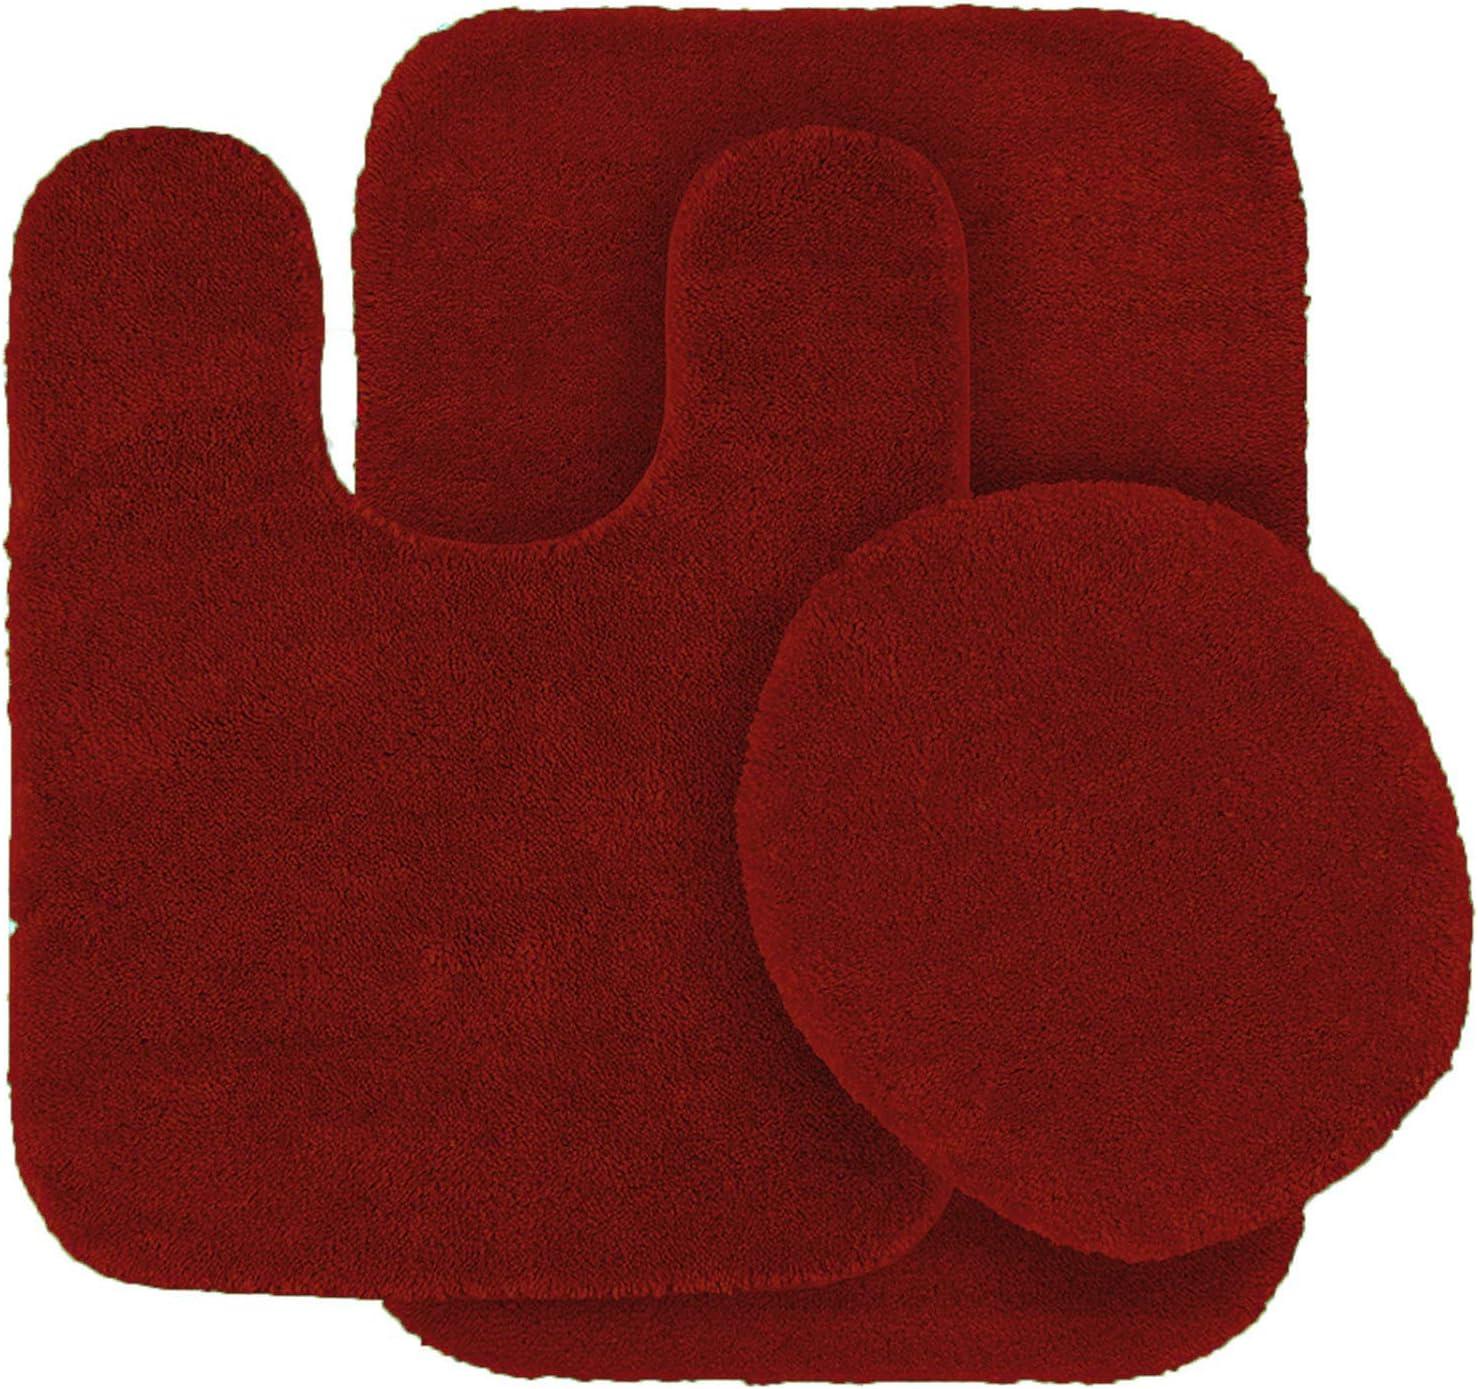 Mk Home 3pc Angela Non Slip Soft Bath Set Rugs for Bathroom Bath Rug, Contour Mat, Toilet Seat Cover New (Red)